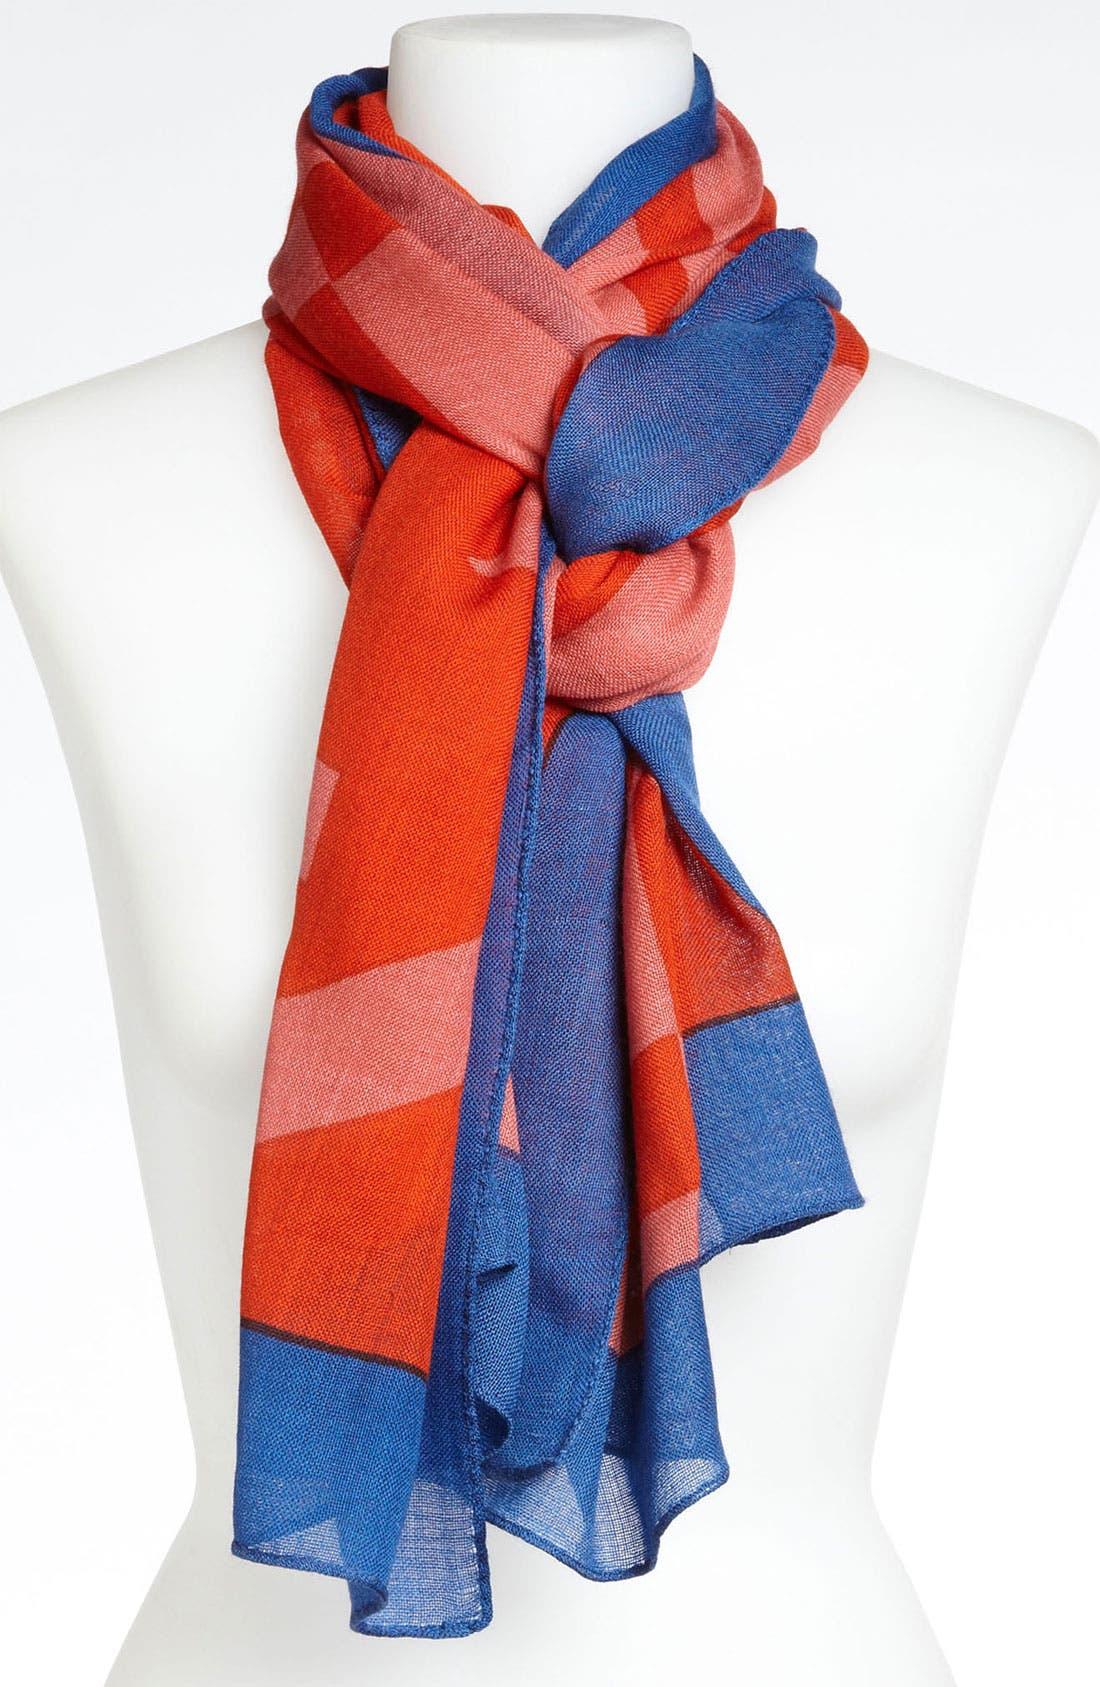 Main Image - Tory Burch 'Reva' Print Wool Scarf